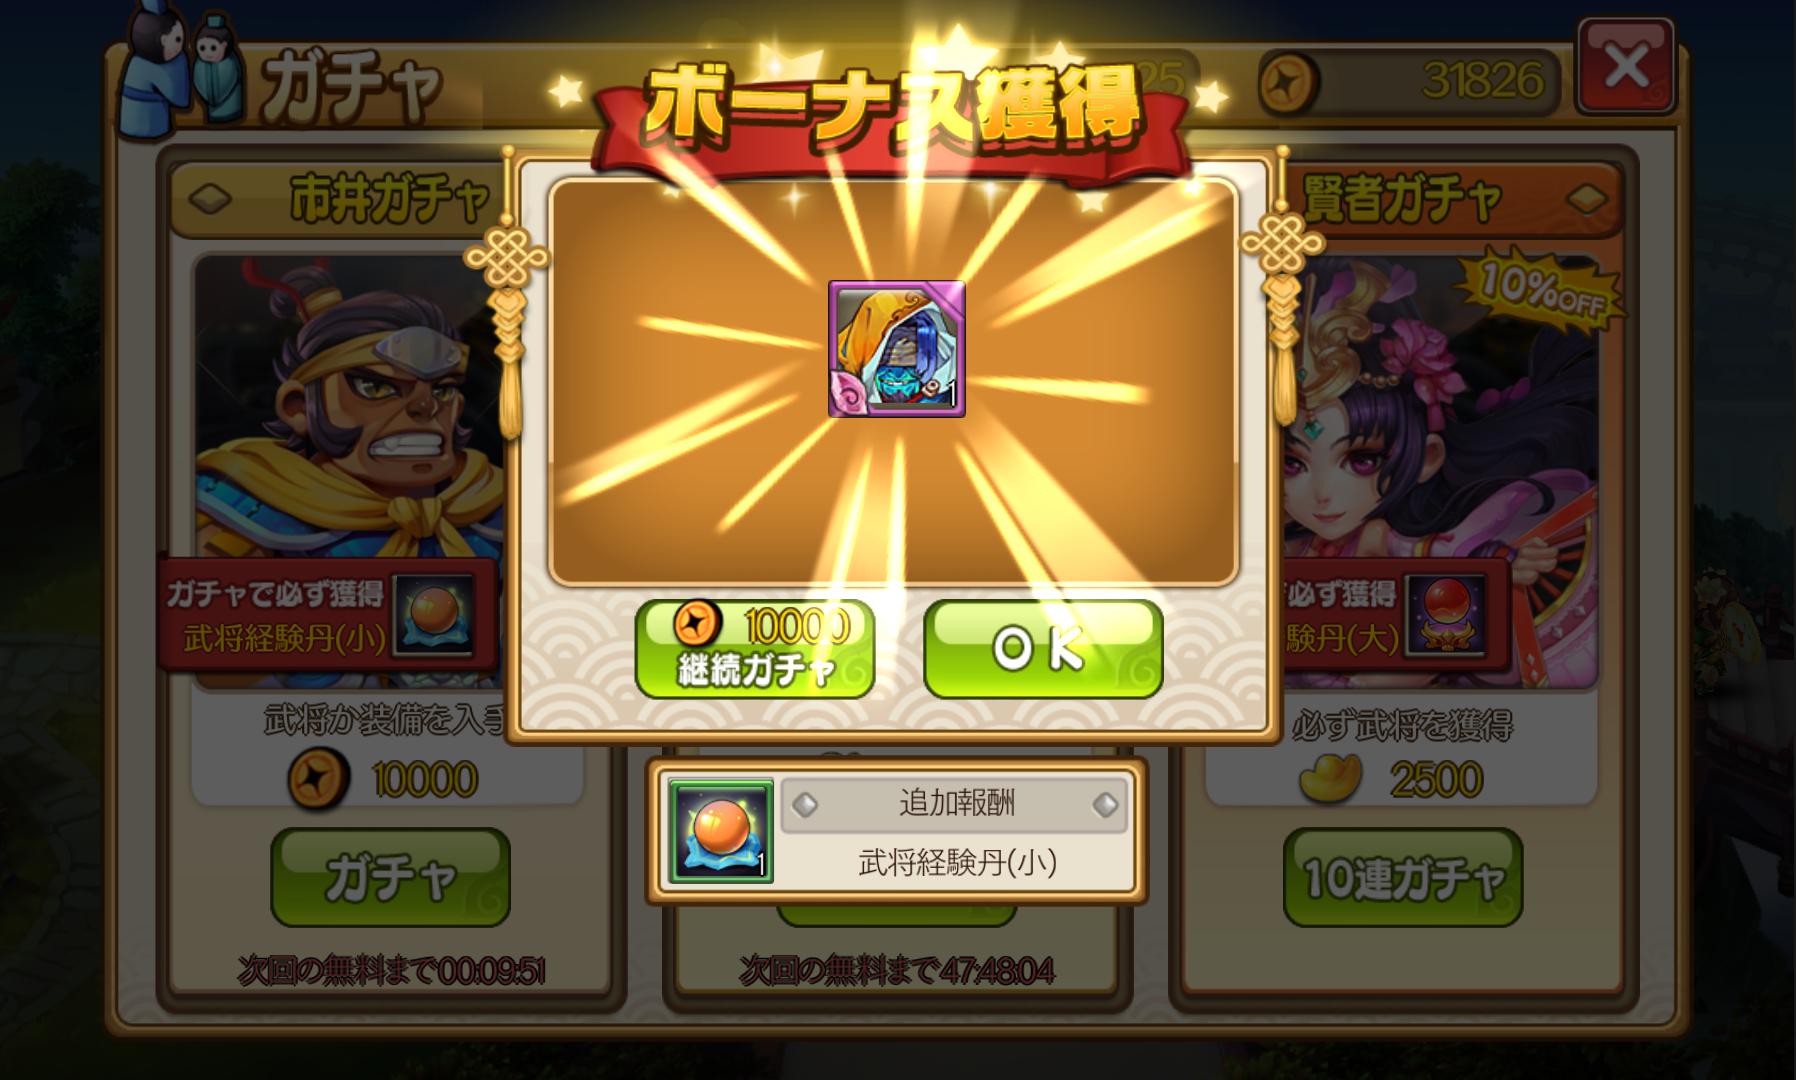 androidアプリ 三国志繚乱バトル攻略スクリーンショット5